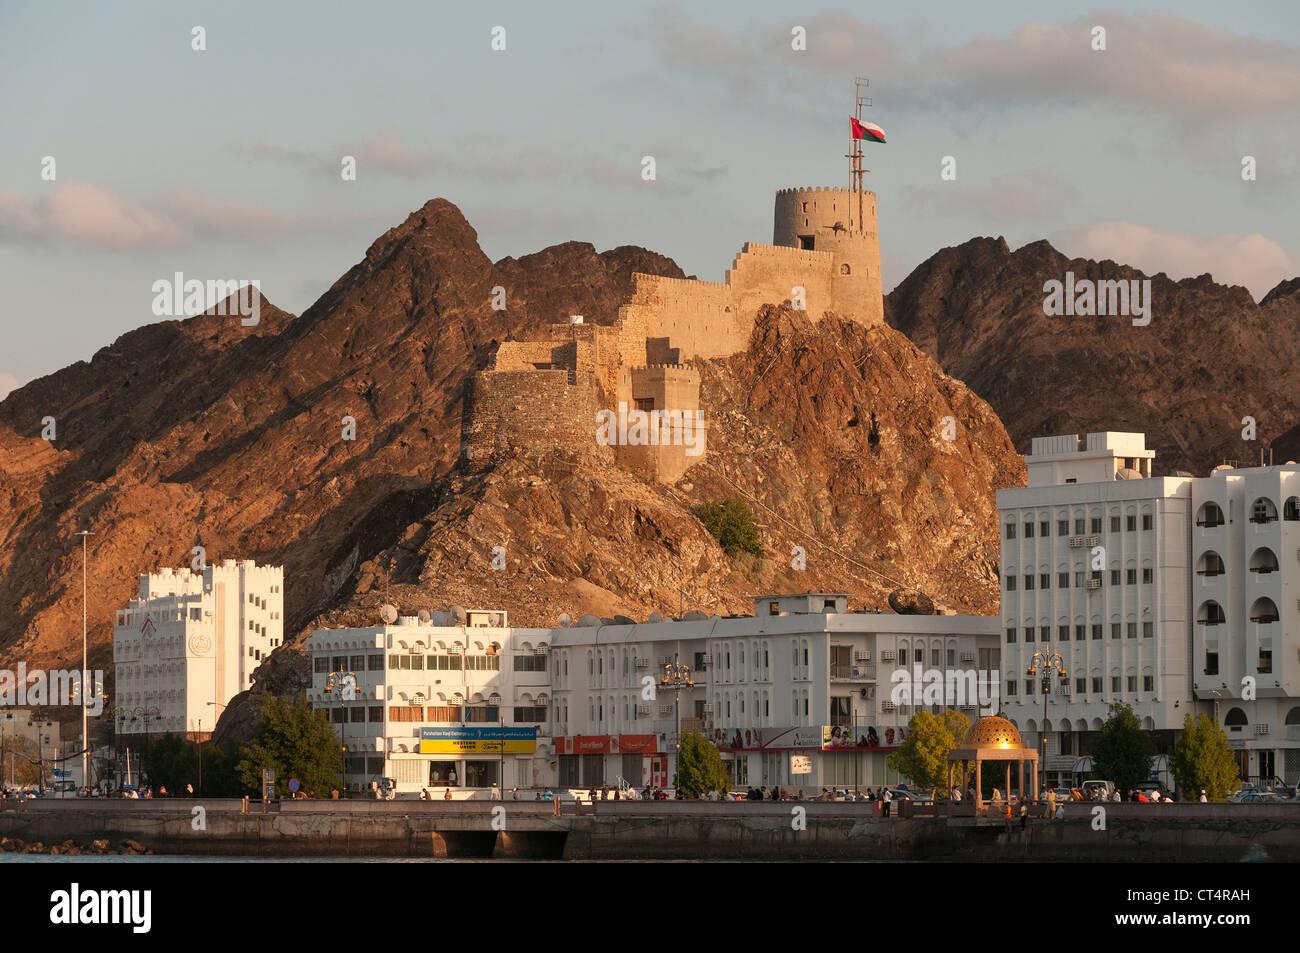 Elk207-1117 Oman, Muscat, Muttrah, Corniche Photo Stock